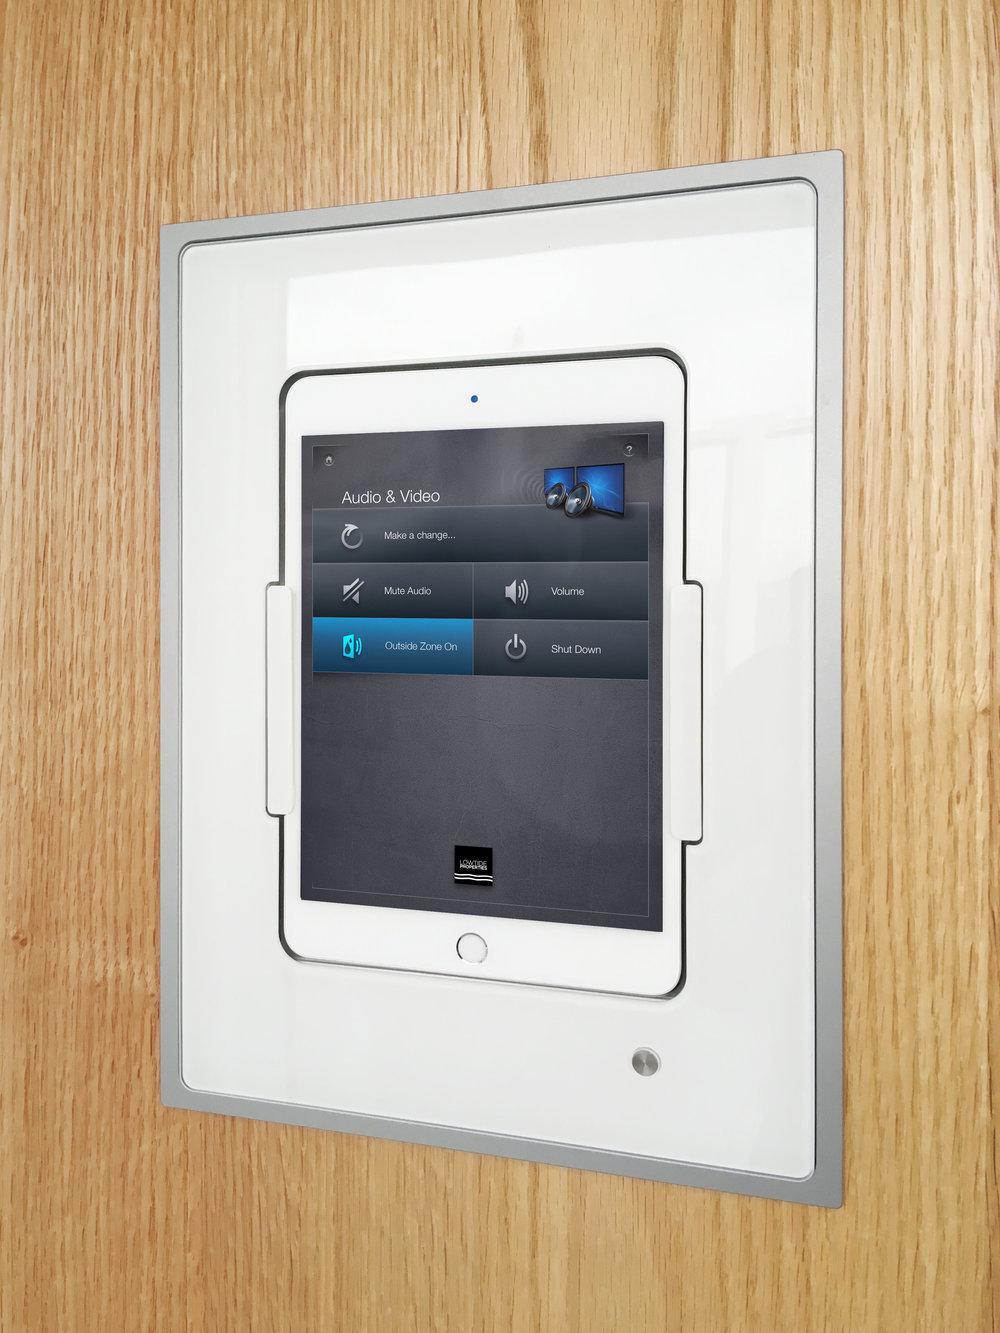 The iPad runs Xprt's proprietary control app, Kutano.